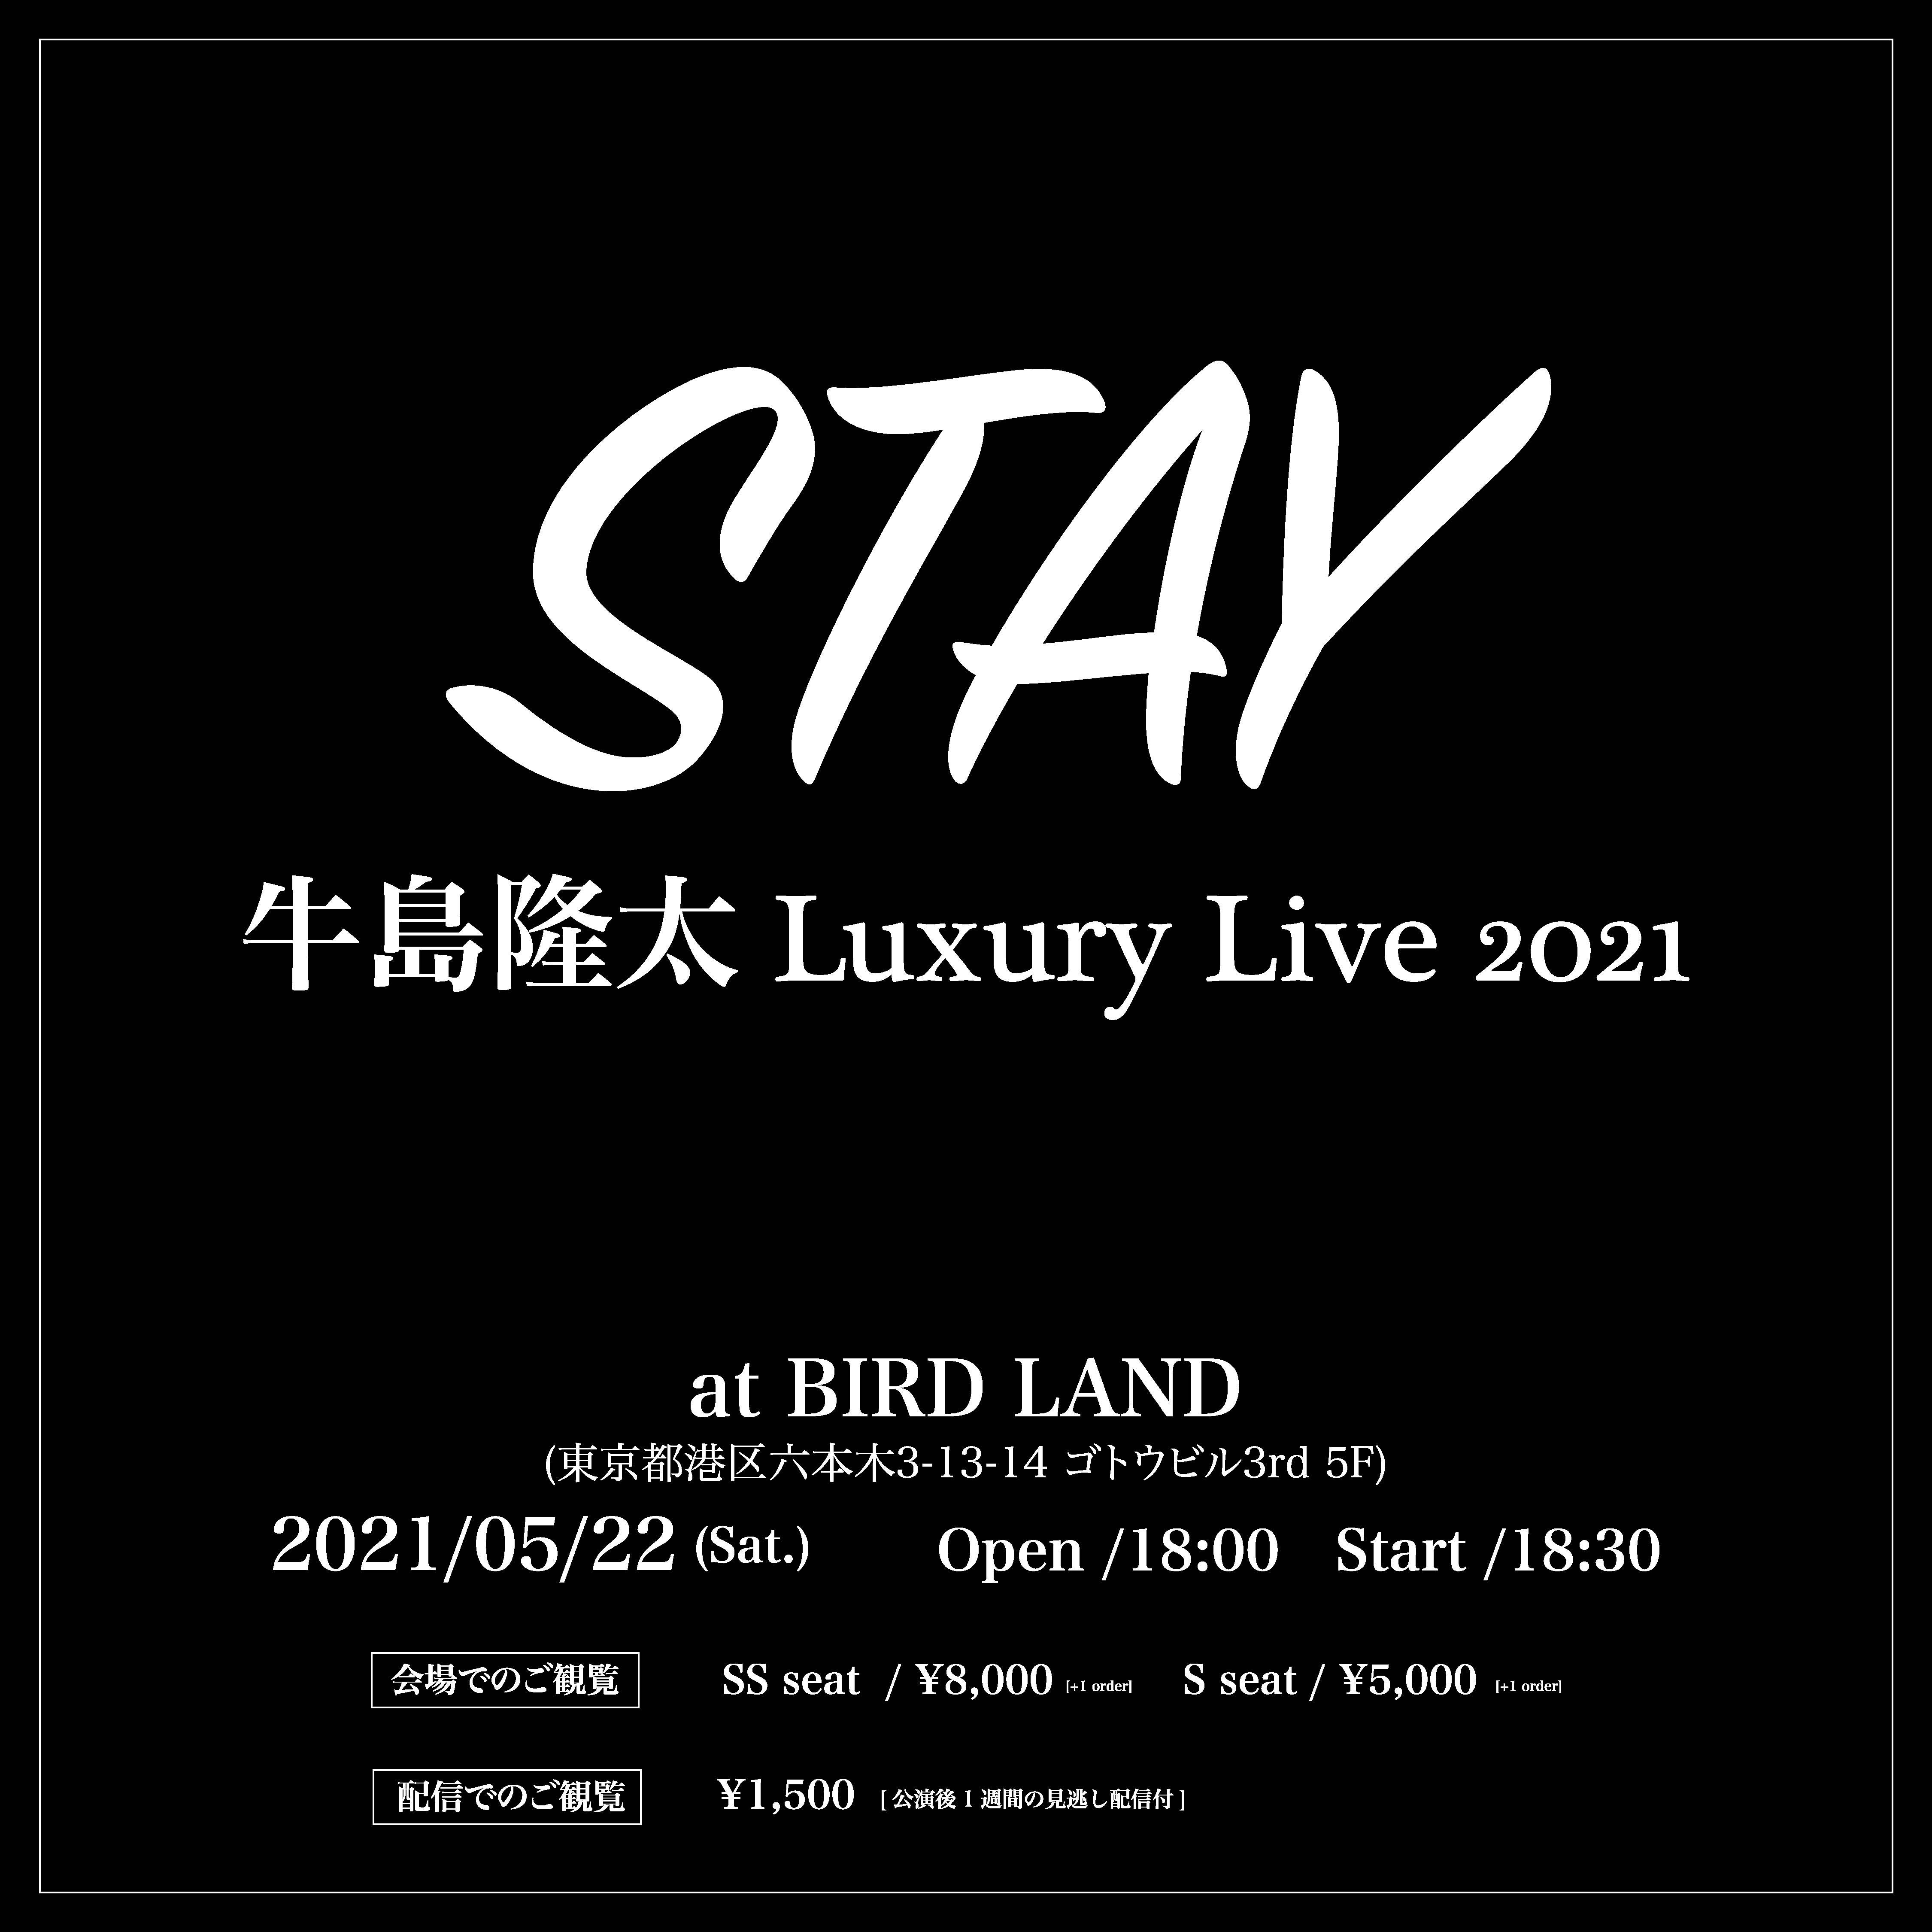 "牛島隆太LuxuryLive 2021 ""STAY""  at BIRD LAND"